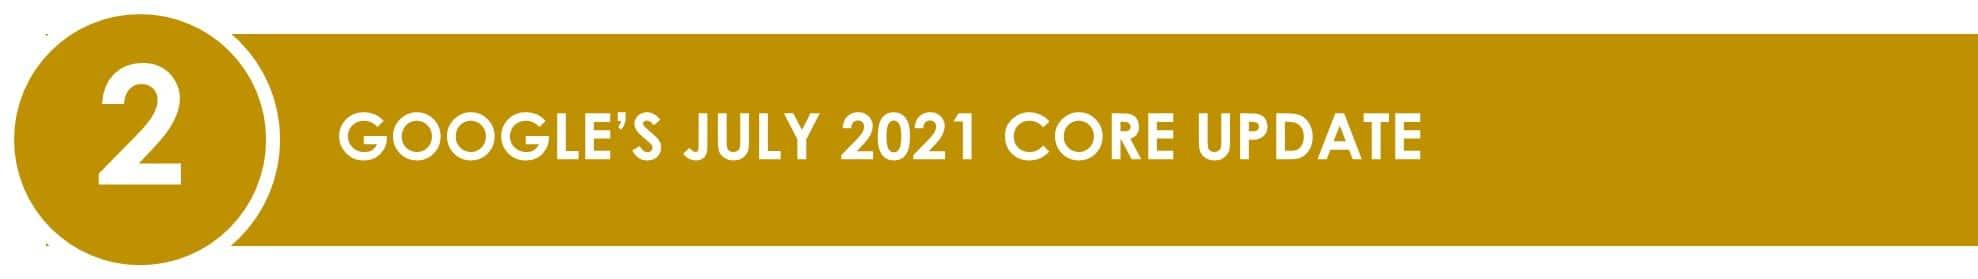 Googles_July_2021_Core_Update